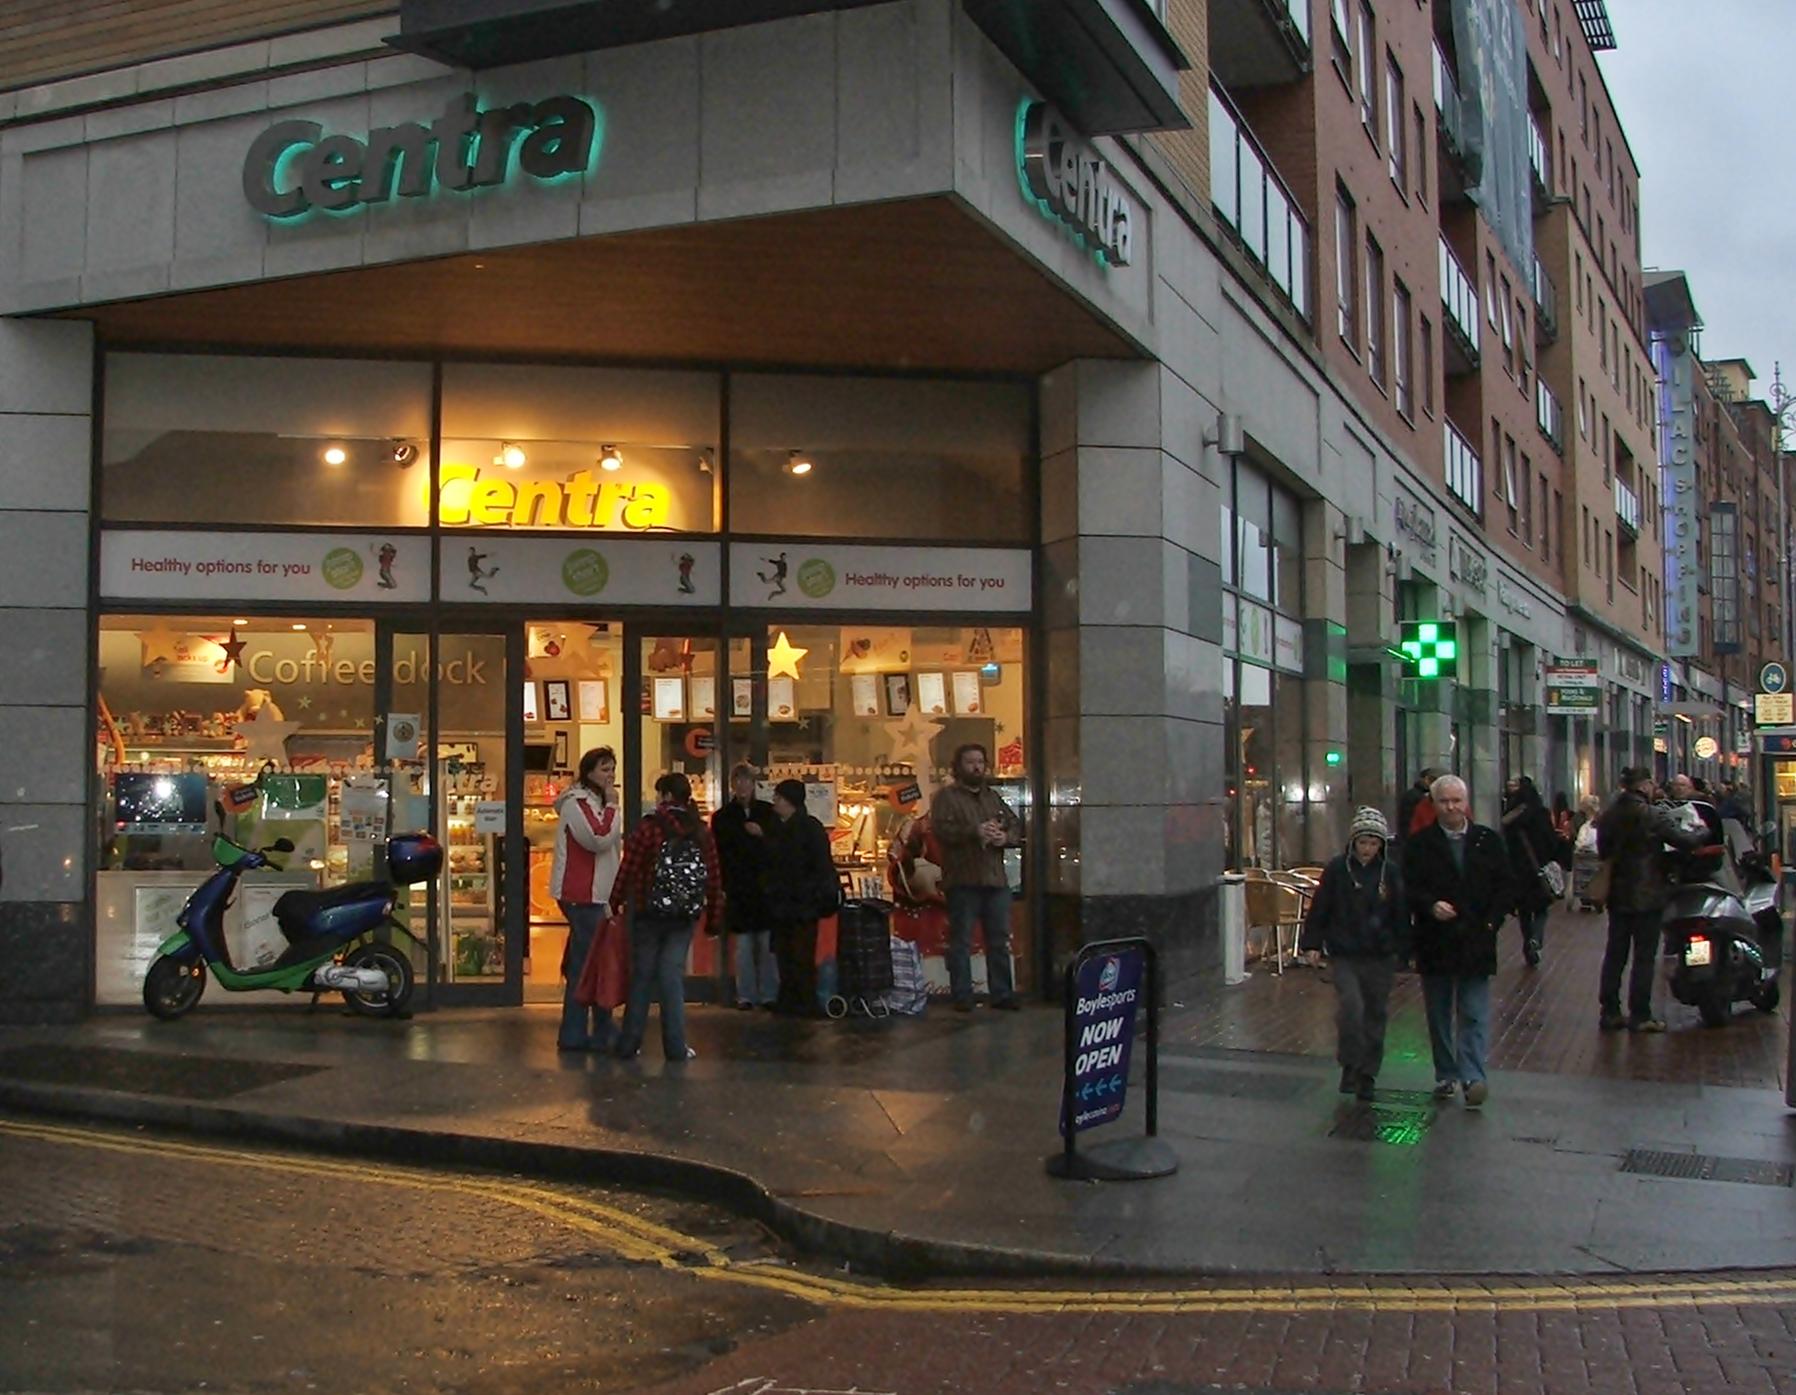 Centra on Parnell Street, Dublin | © Jaqian / WikiCommons